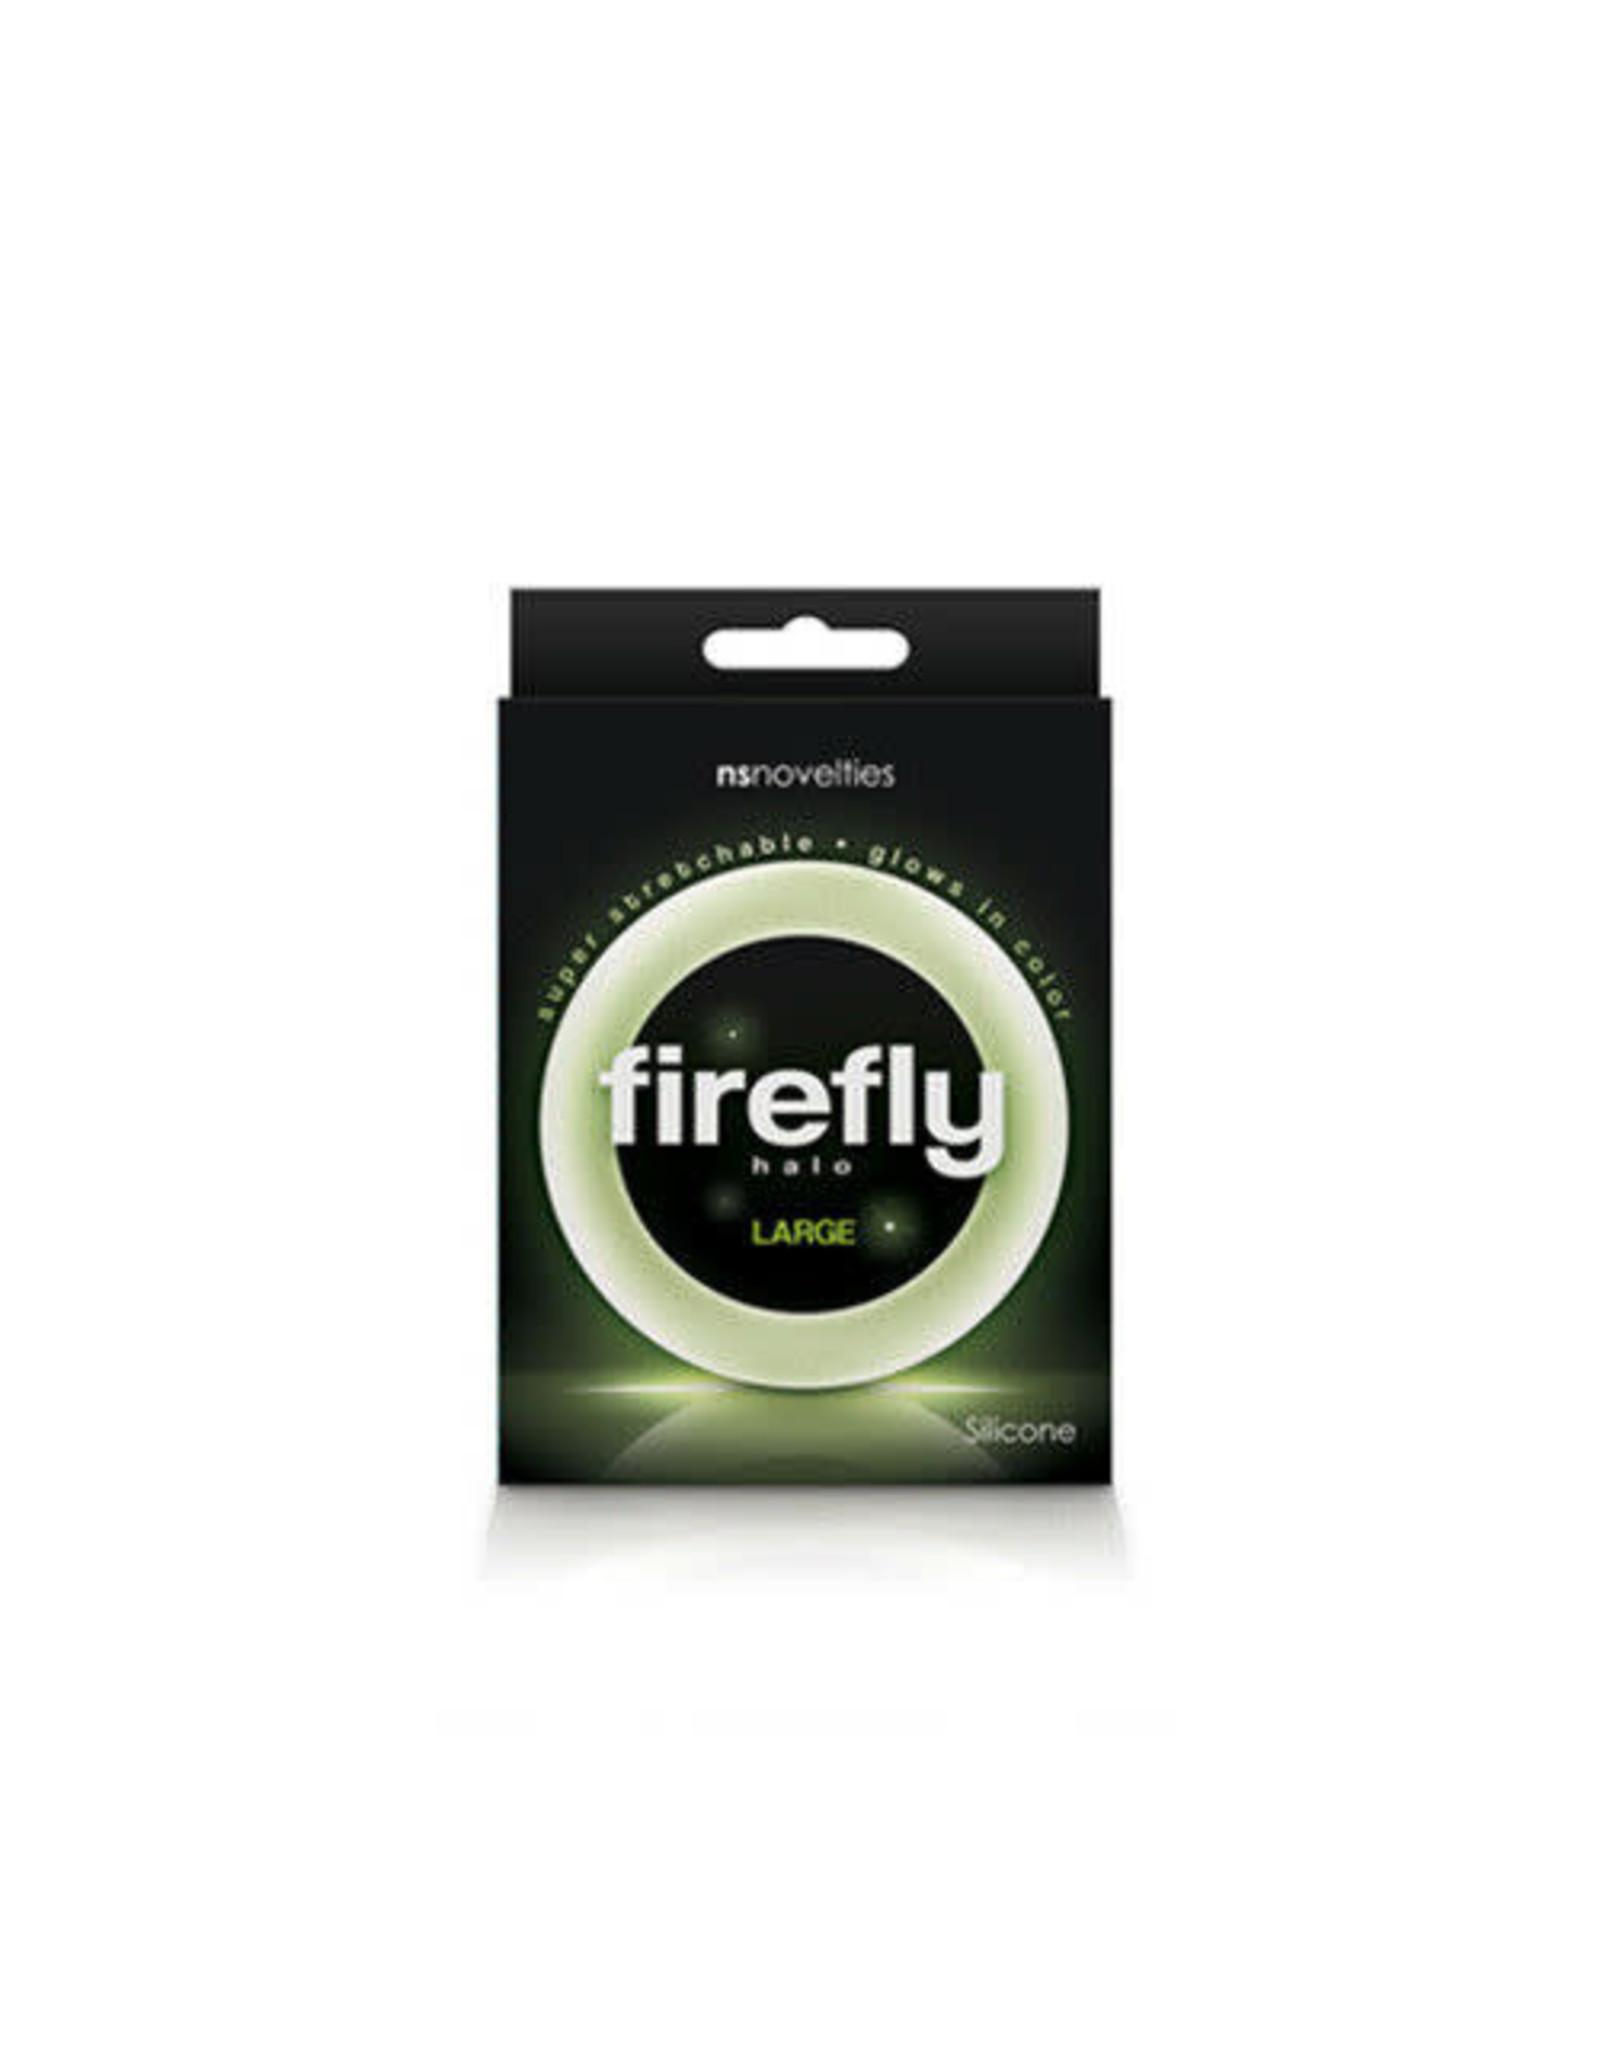 FIREFLY HALO LARGE GLOW